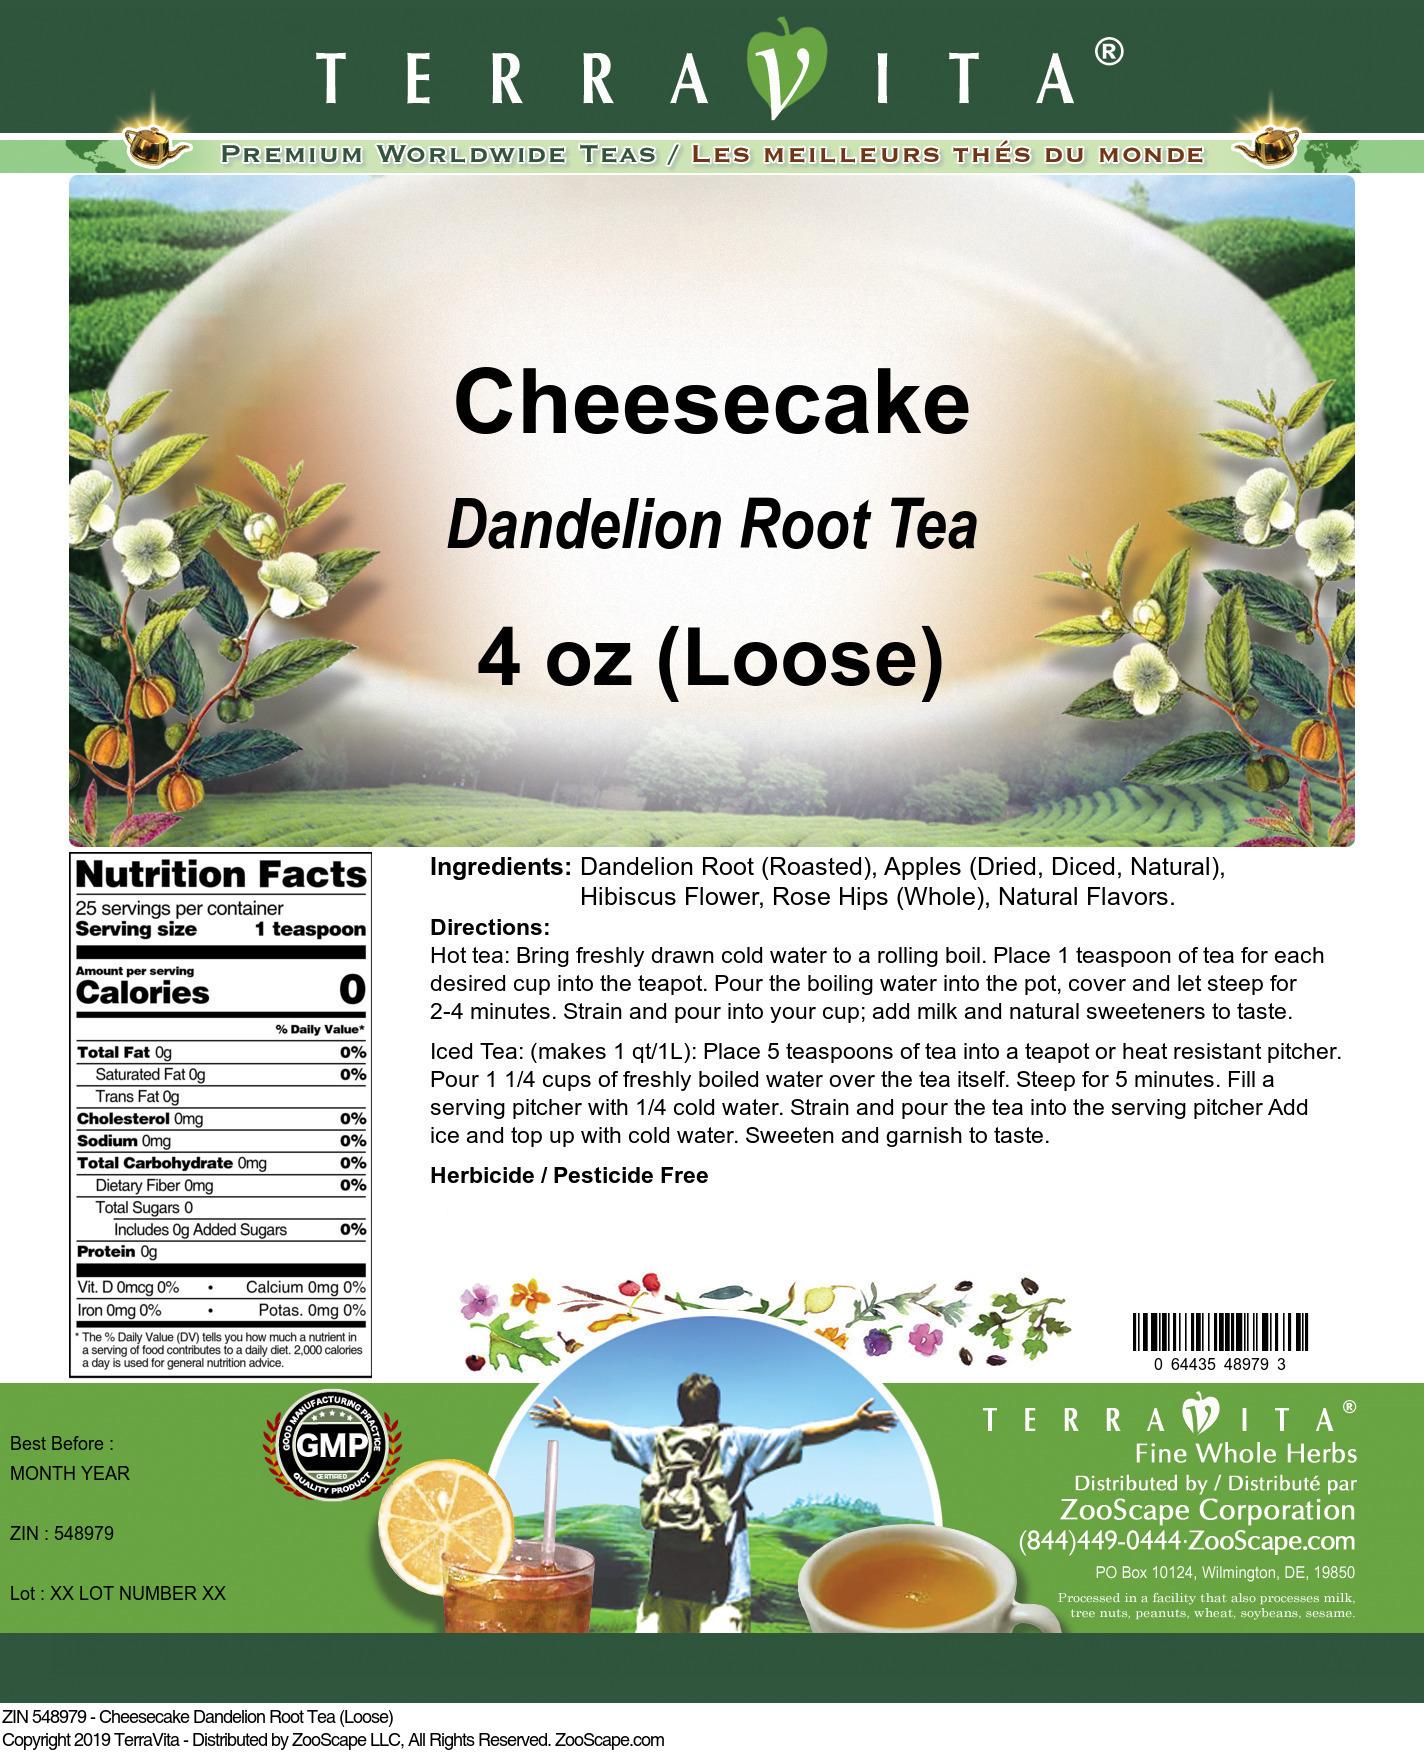 Cheesecake Dandelion Root Tea (Loose)